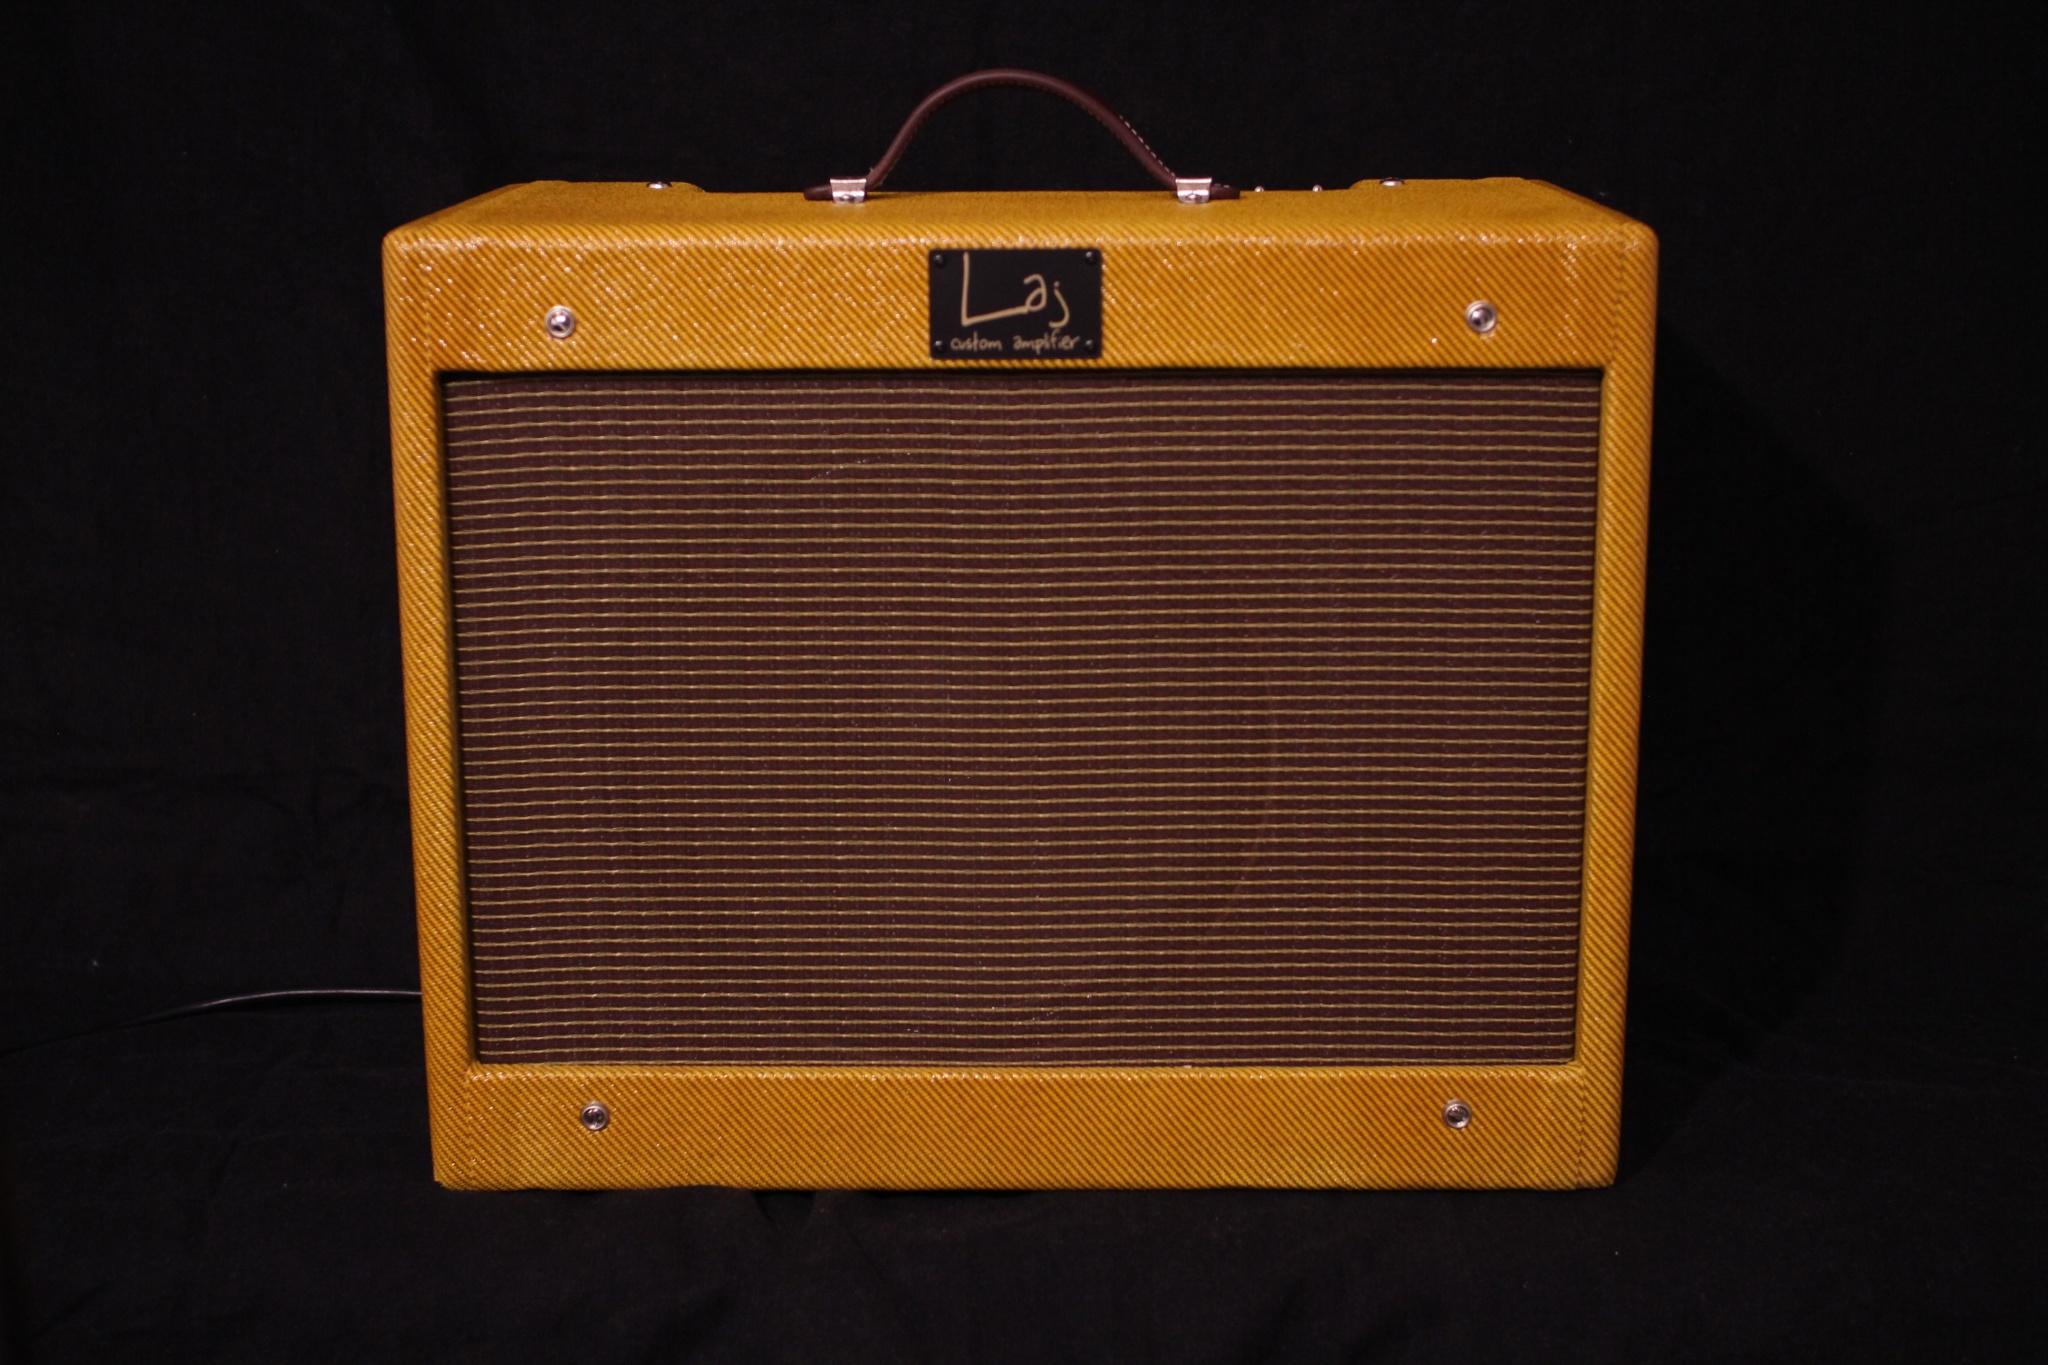 IMG 2167 - Amplificador LAJ Speed Reverb